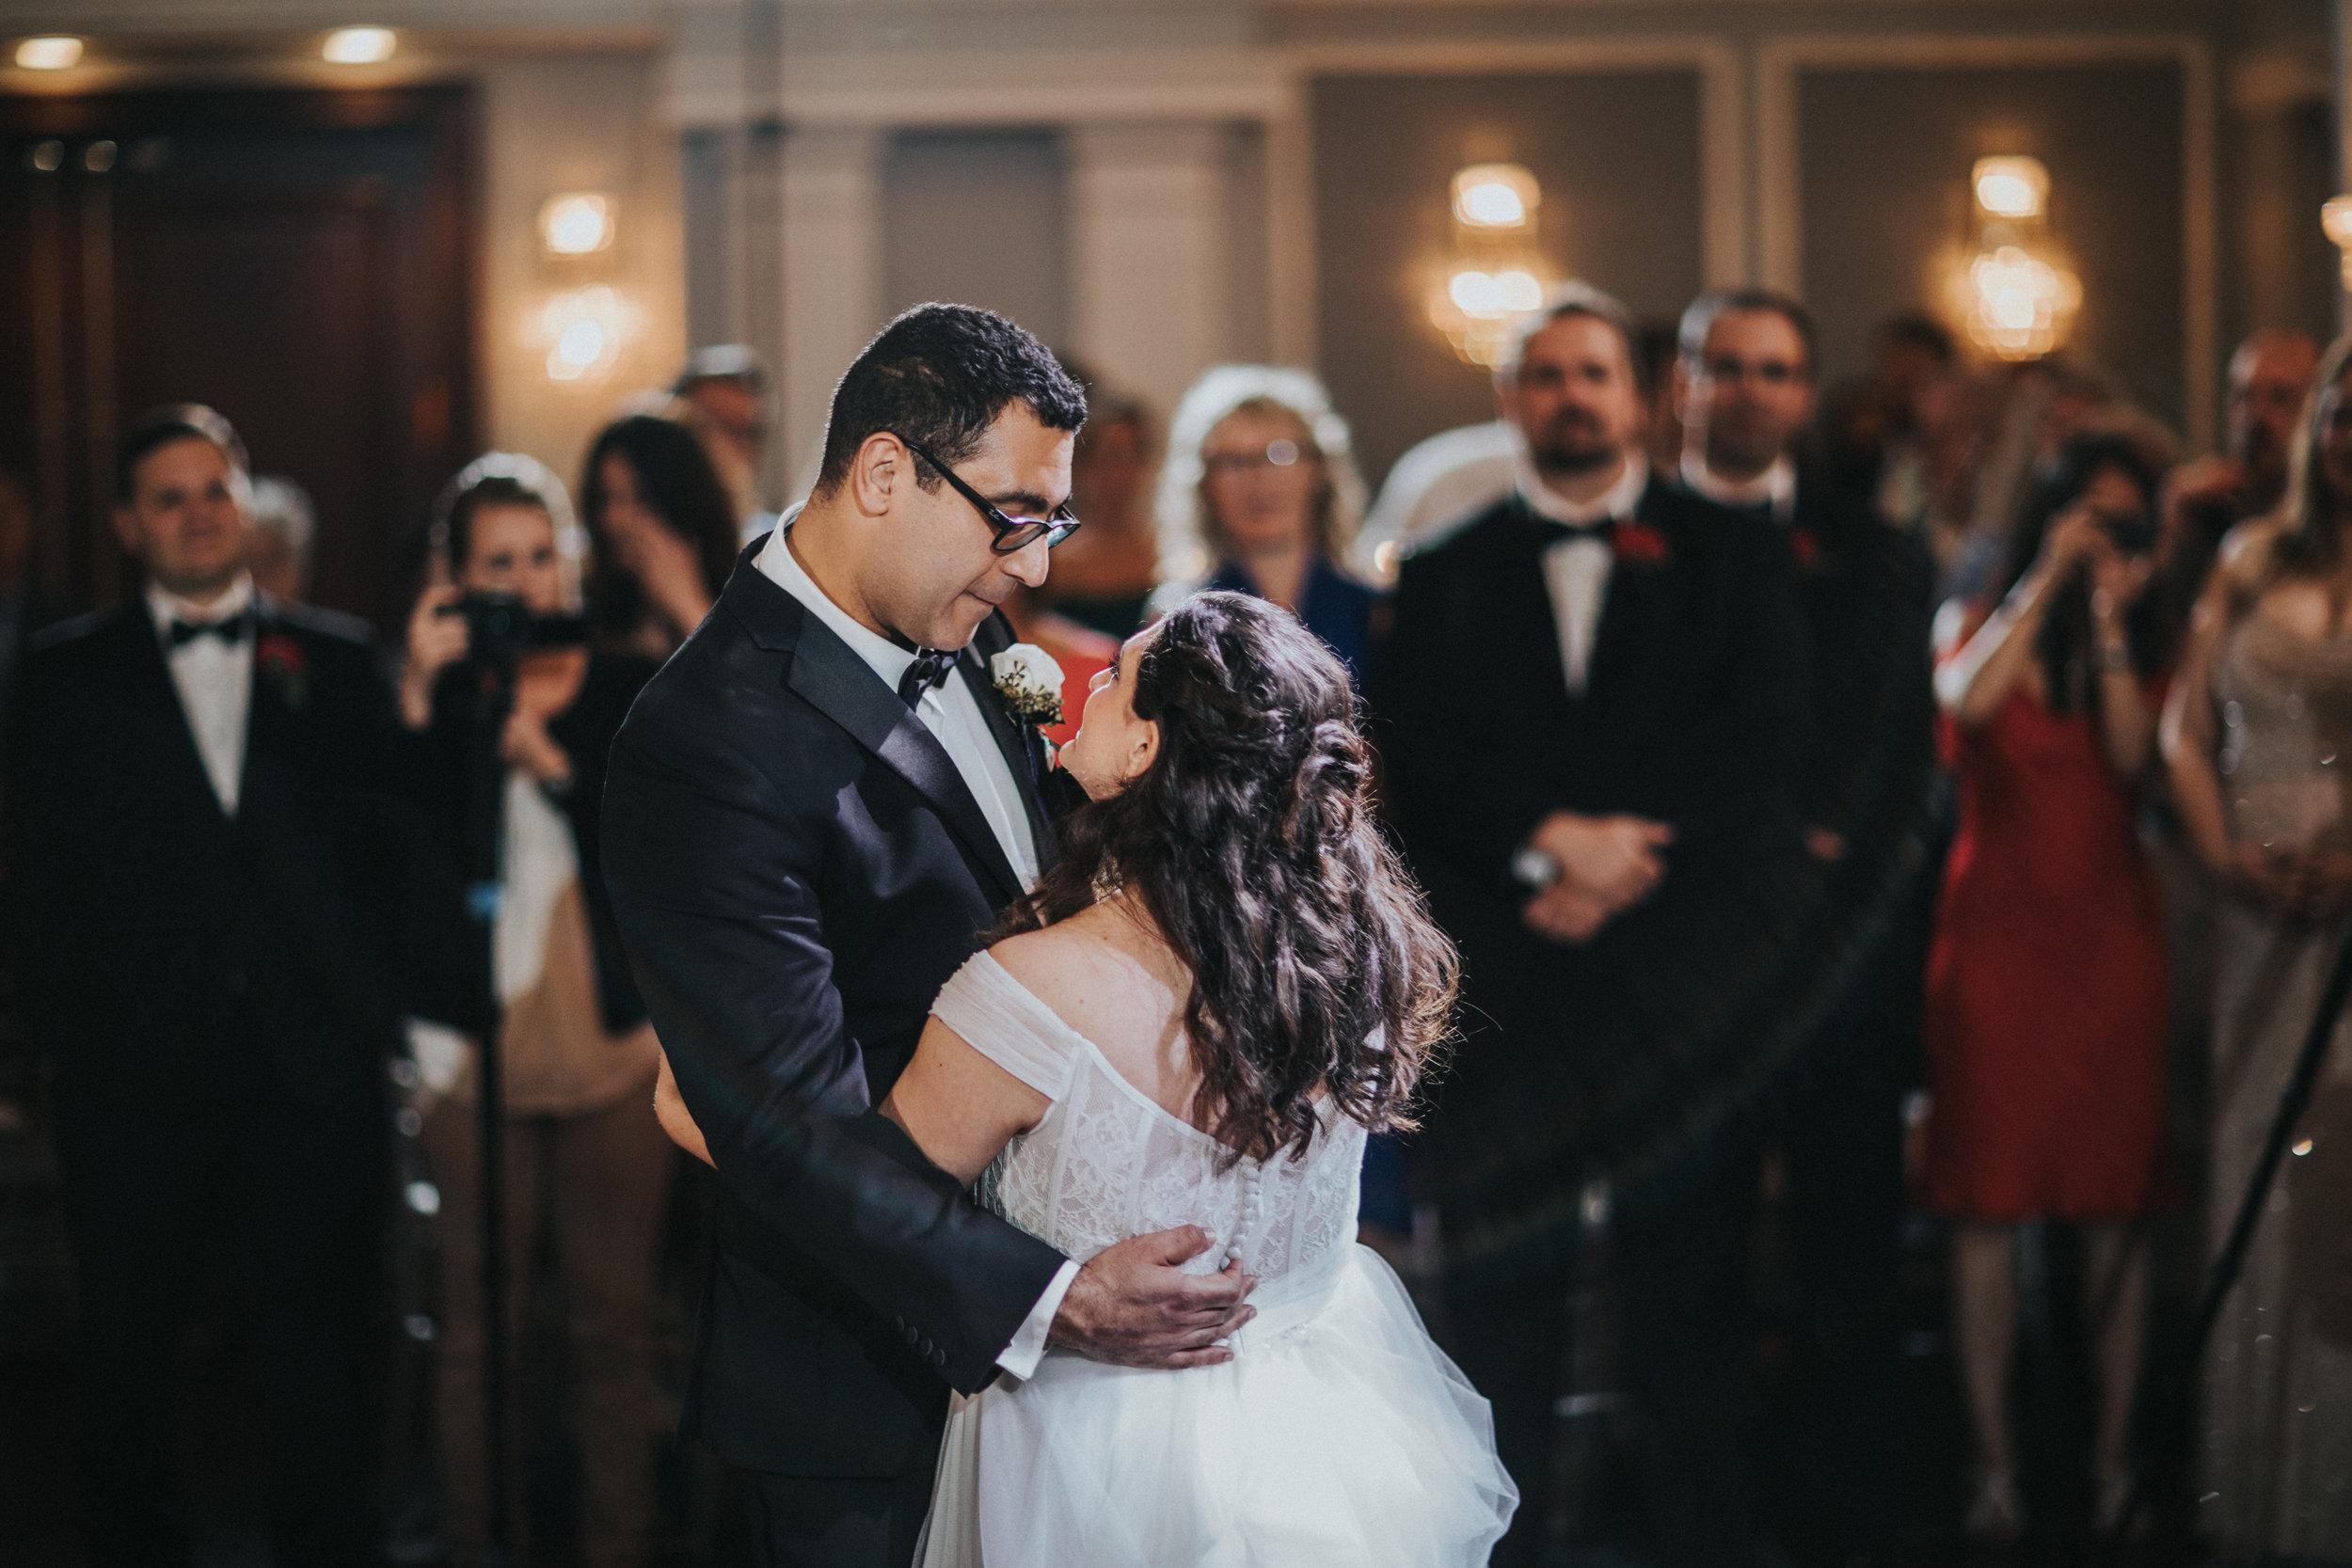 JennaLynnPhotography-NJWeddingPhotographer-Philadelphia-Wedding-ArtsBallroom-Reception-67.jpg